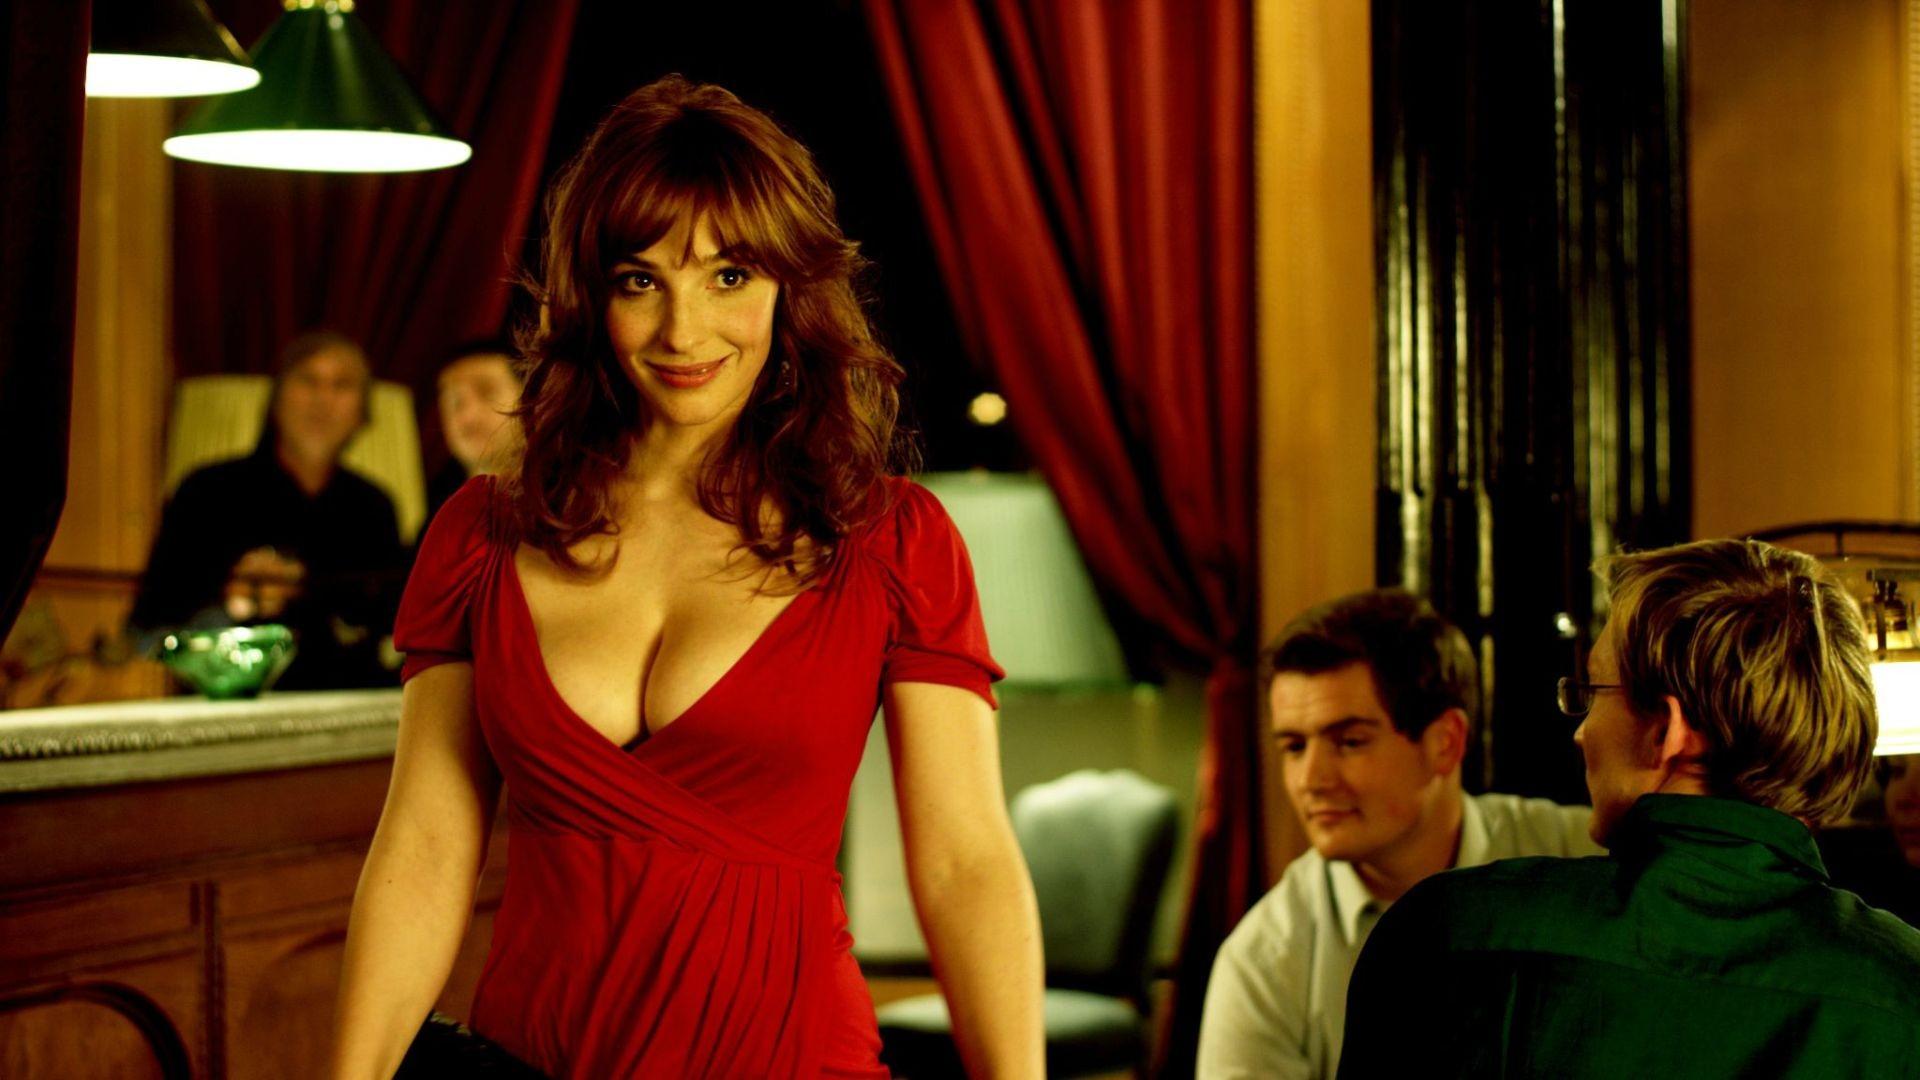 People 1920x1080 women redhead red dress dress cleavage big boobs Vica Kerekes movies film stills screen shot smiling women indoors men